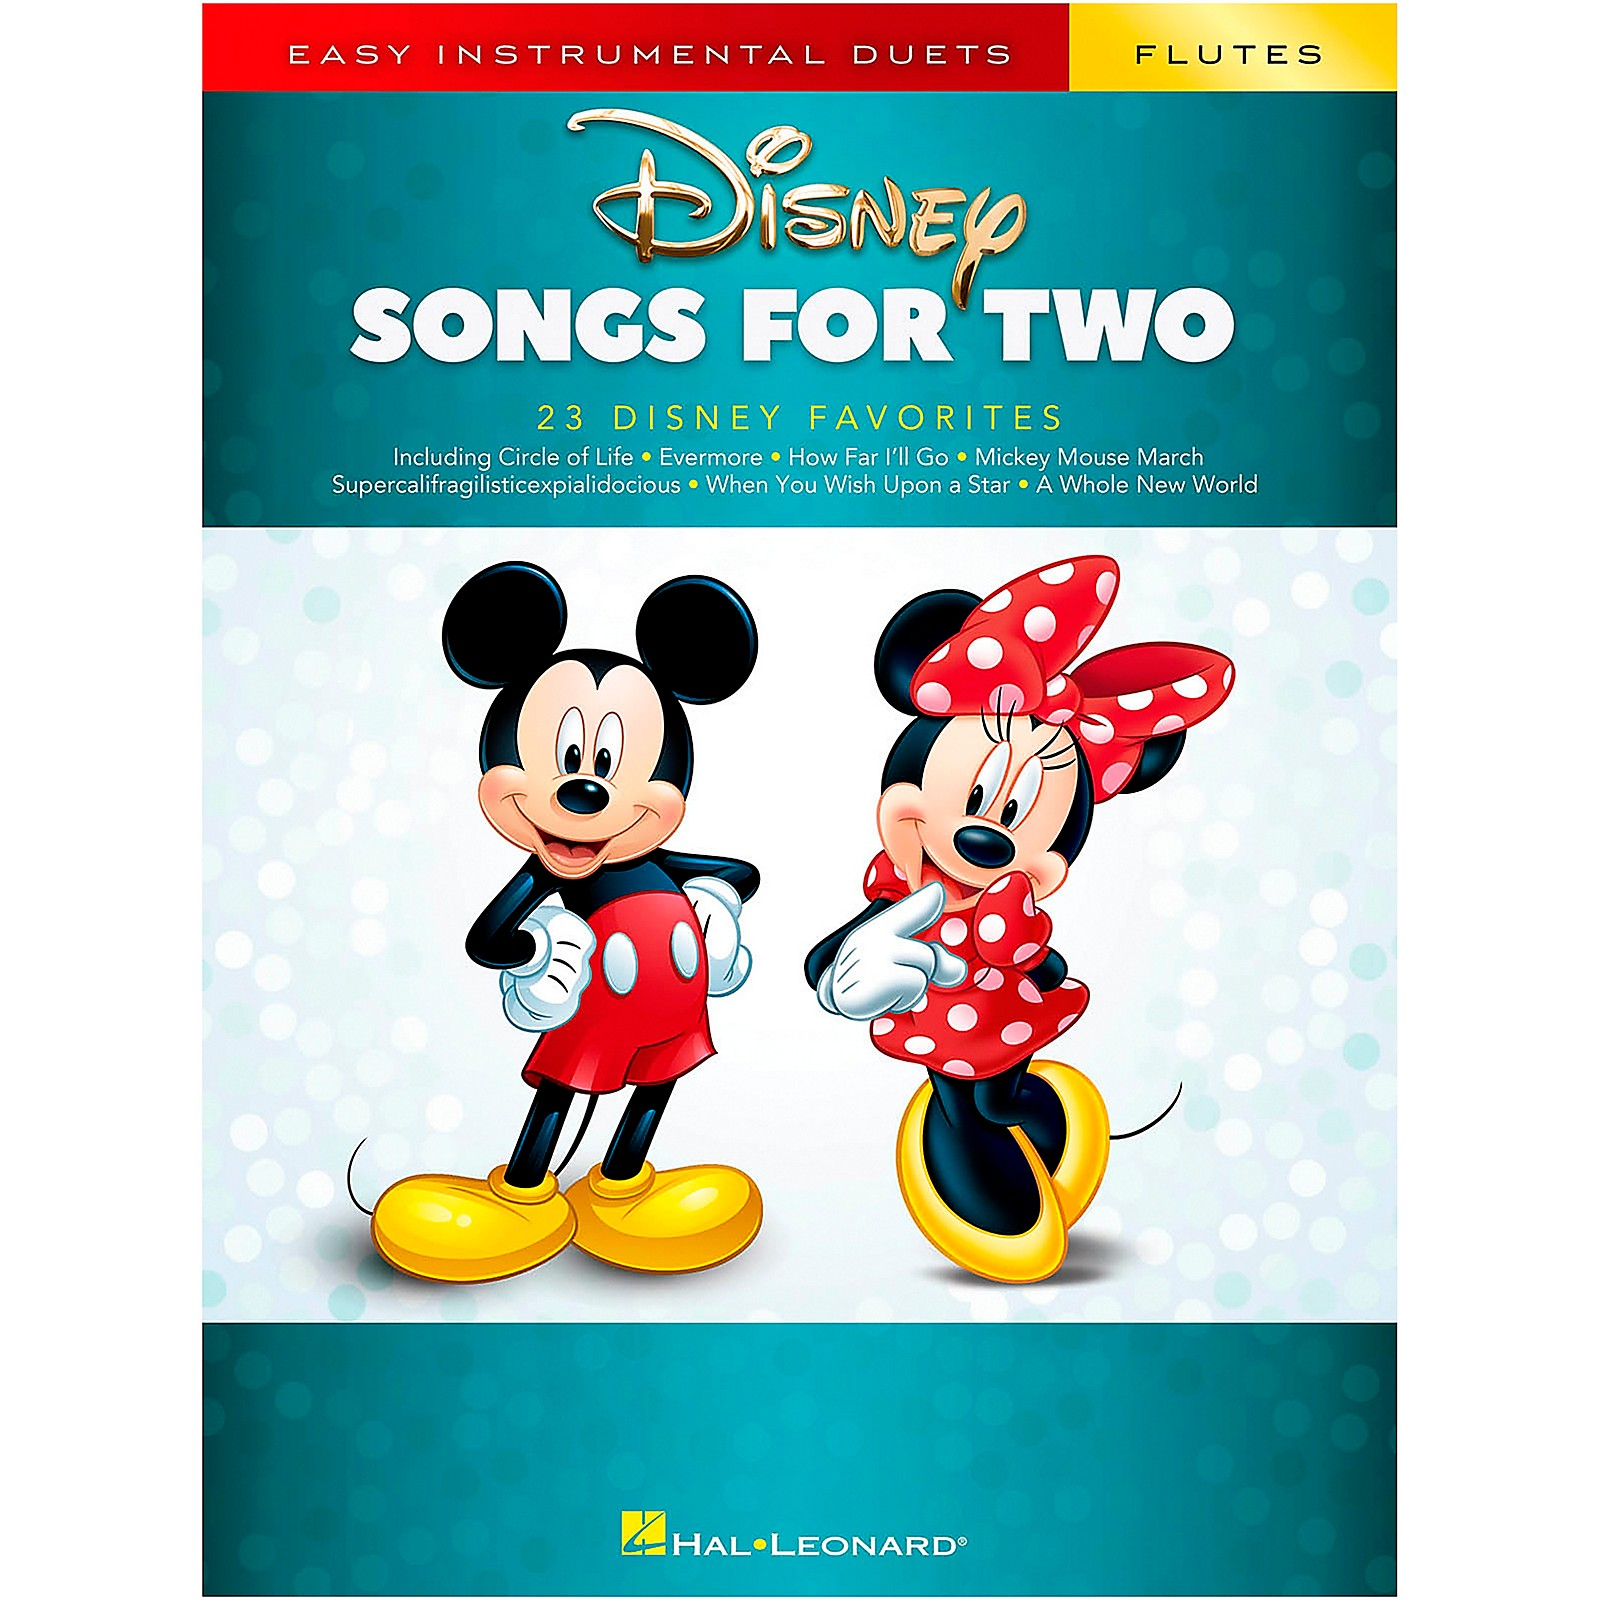 Hal Leonard Disney Songs for Two Flutes - Easy Instrumental Duets Series Songbook